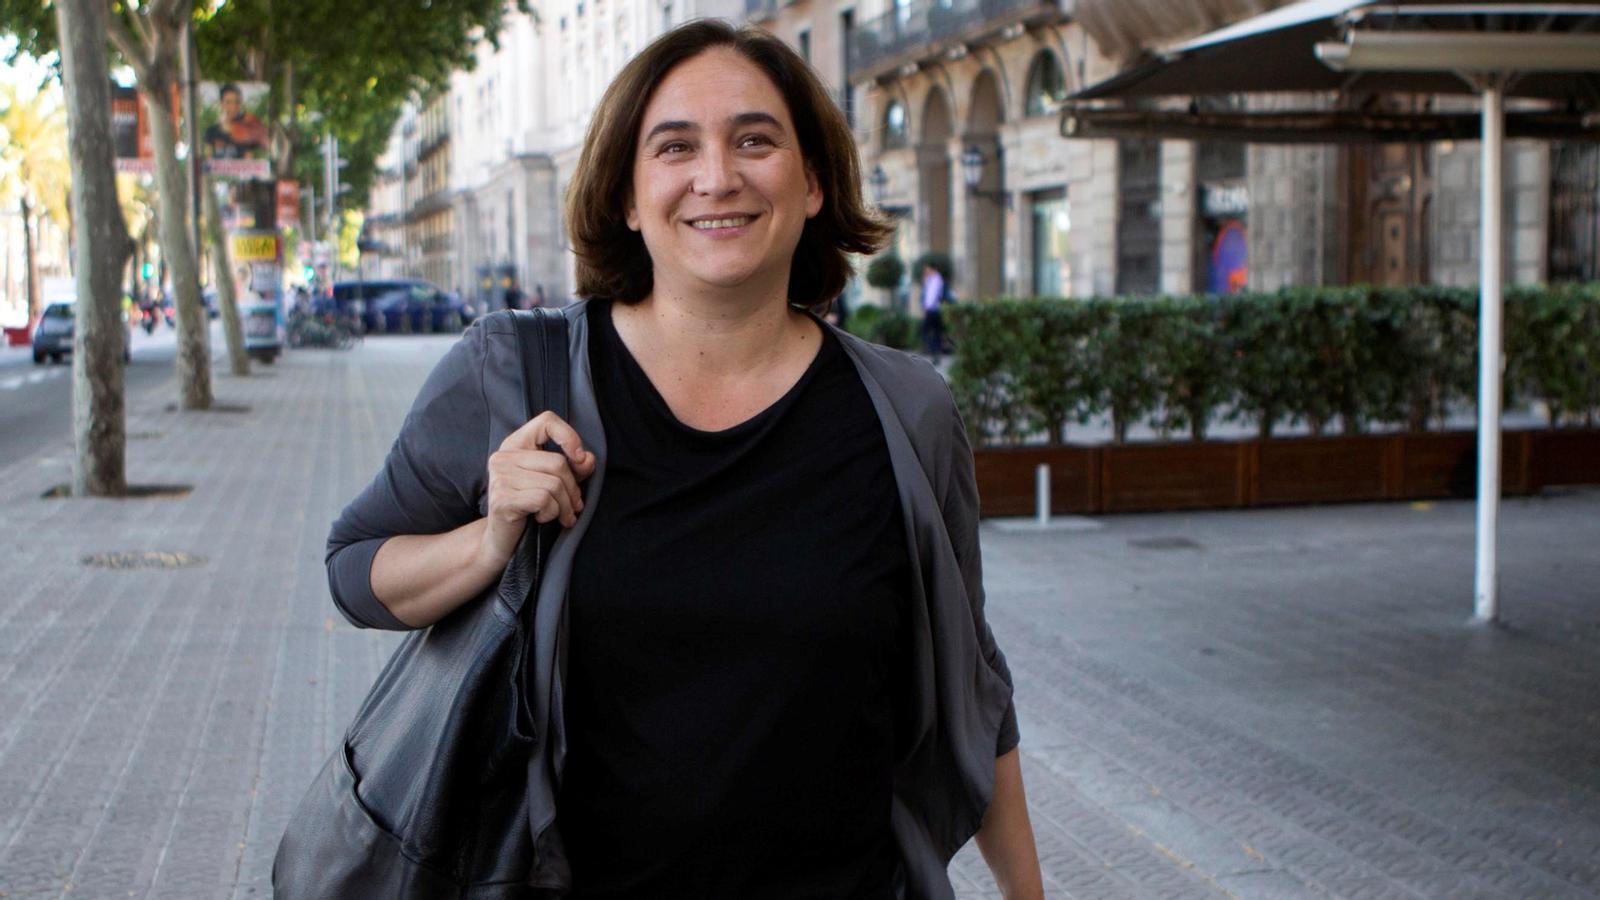 L'anàlisi d'Antoni Bassas: 'Probable alcaldessa'